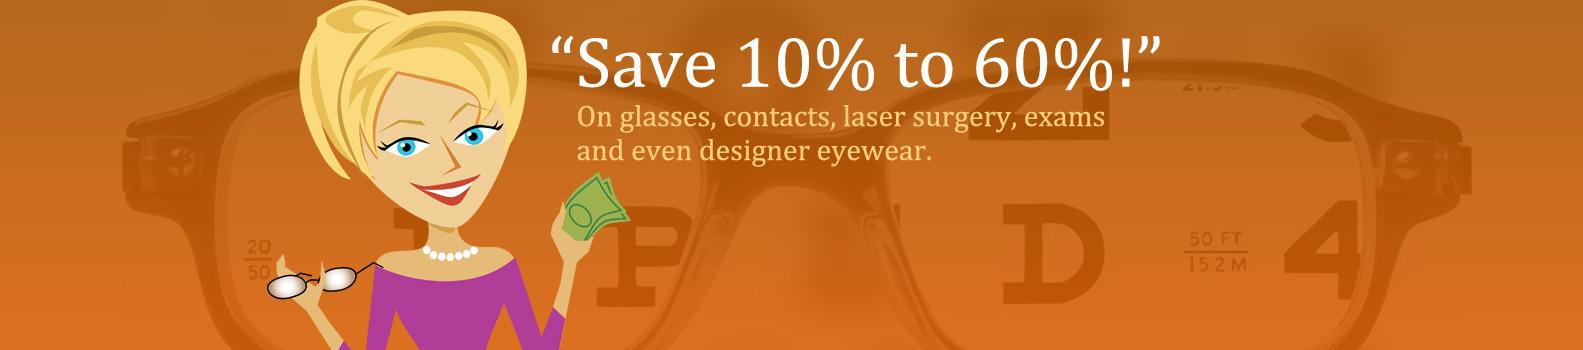 dbs-vision-benefits-hdr